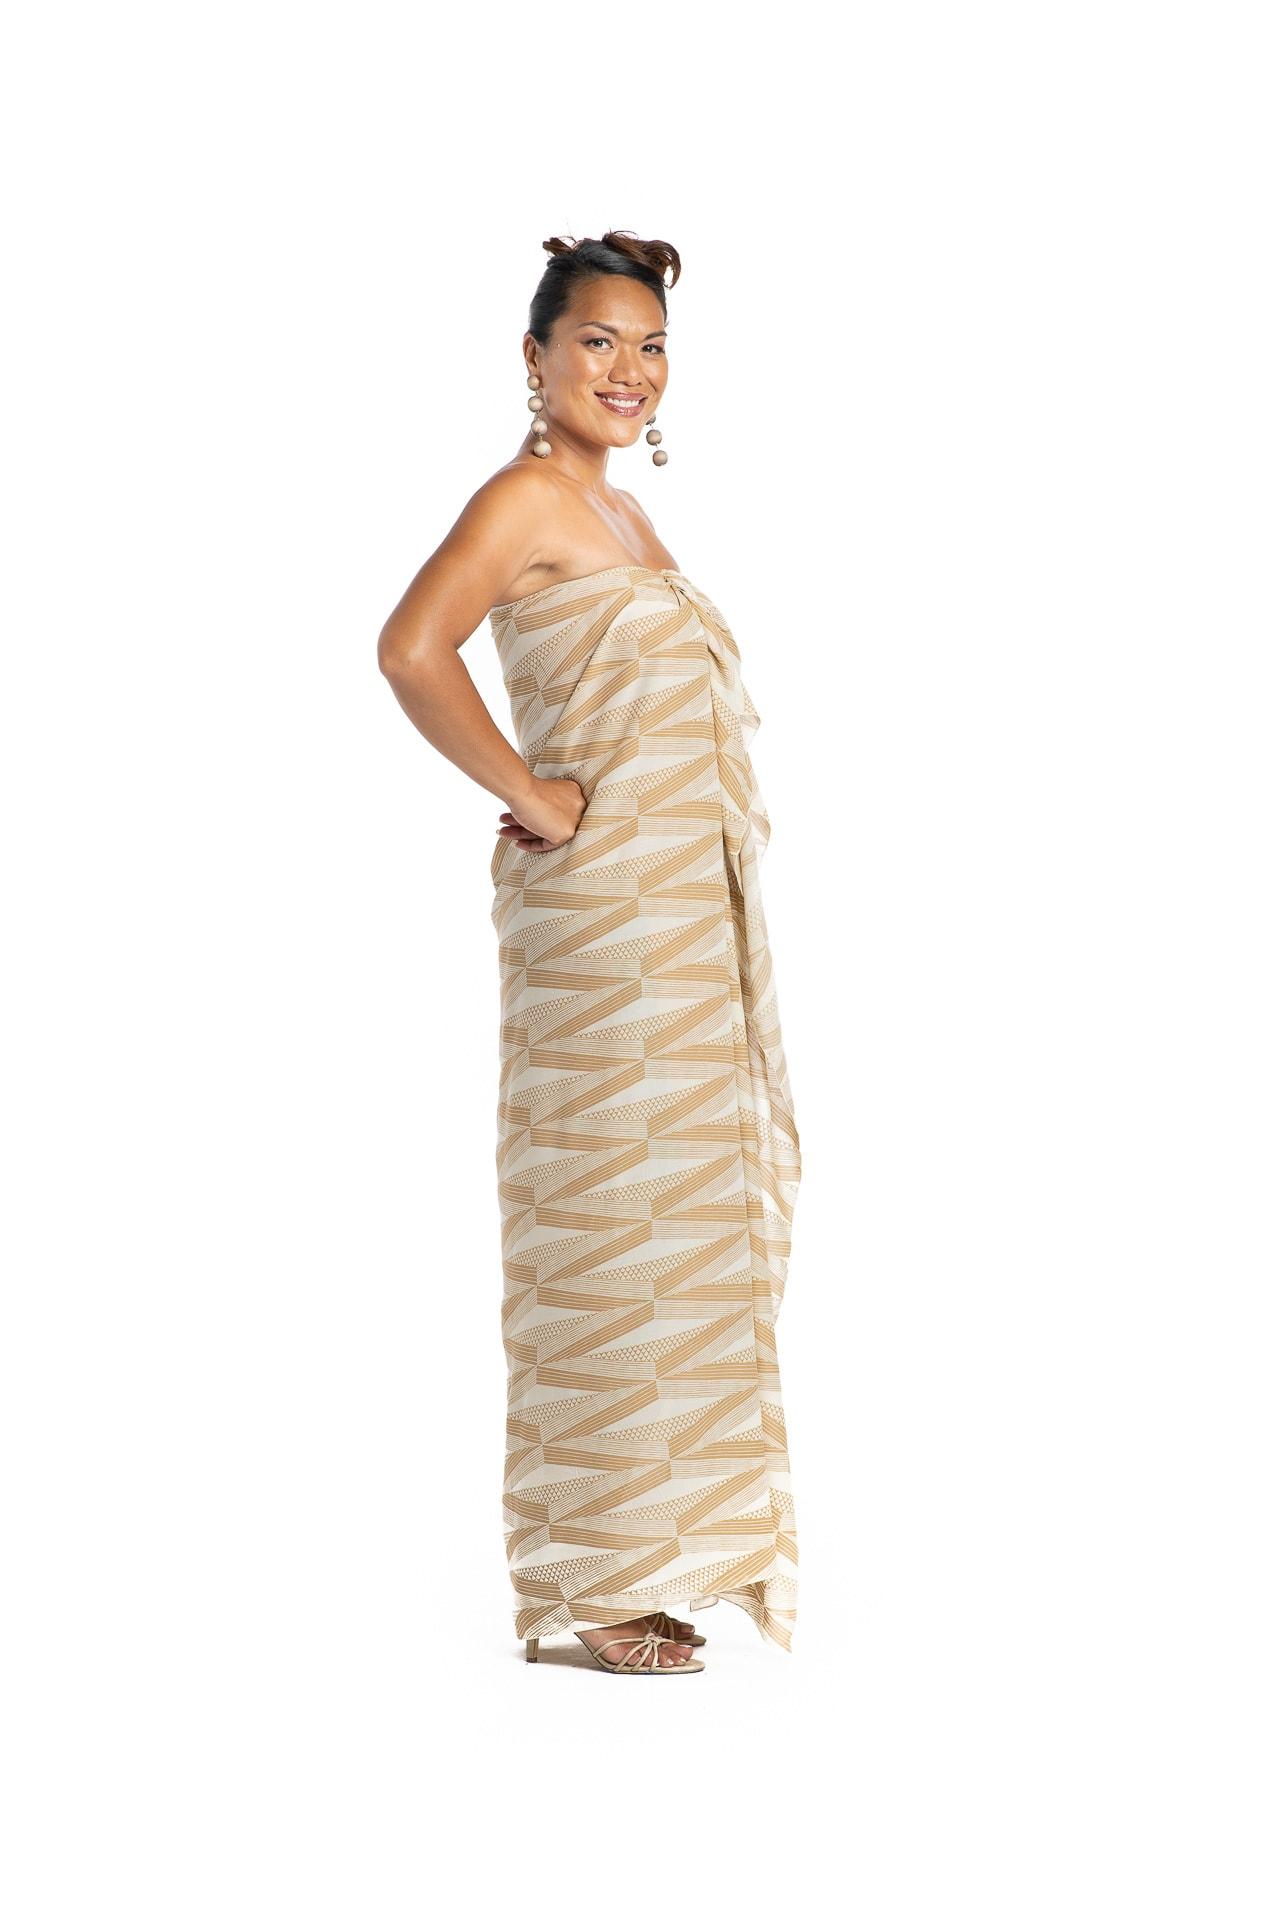 Model wearing Pareo in Thrush Brown/Moonbeam - Side View